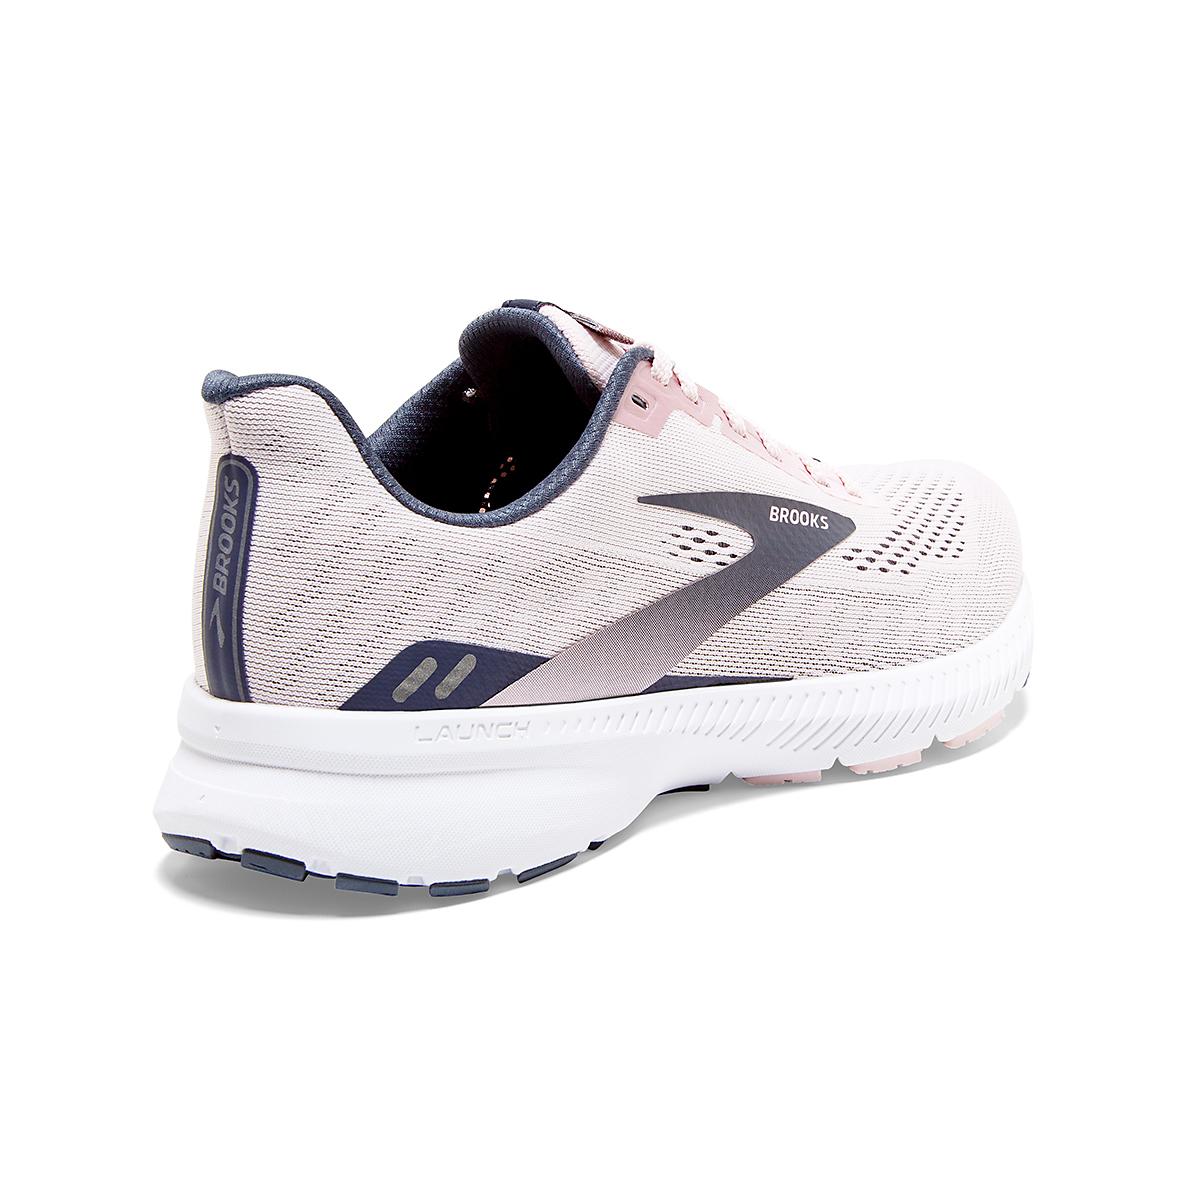 Women's Brooks Launch 8 Running Shoe - Color: Primrose/Ombre/Metallic - Size: 5 - Width: Regular, Primrose/Ombre/Metallic, large, image 3